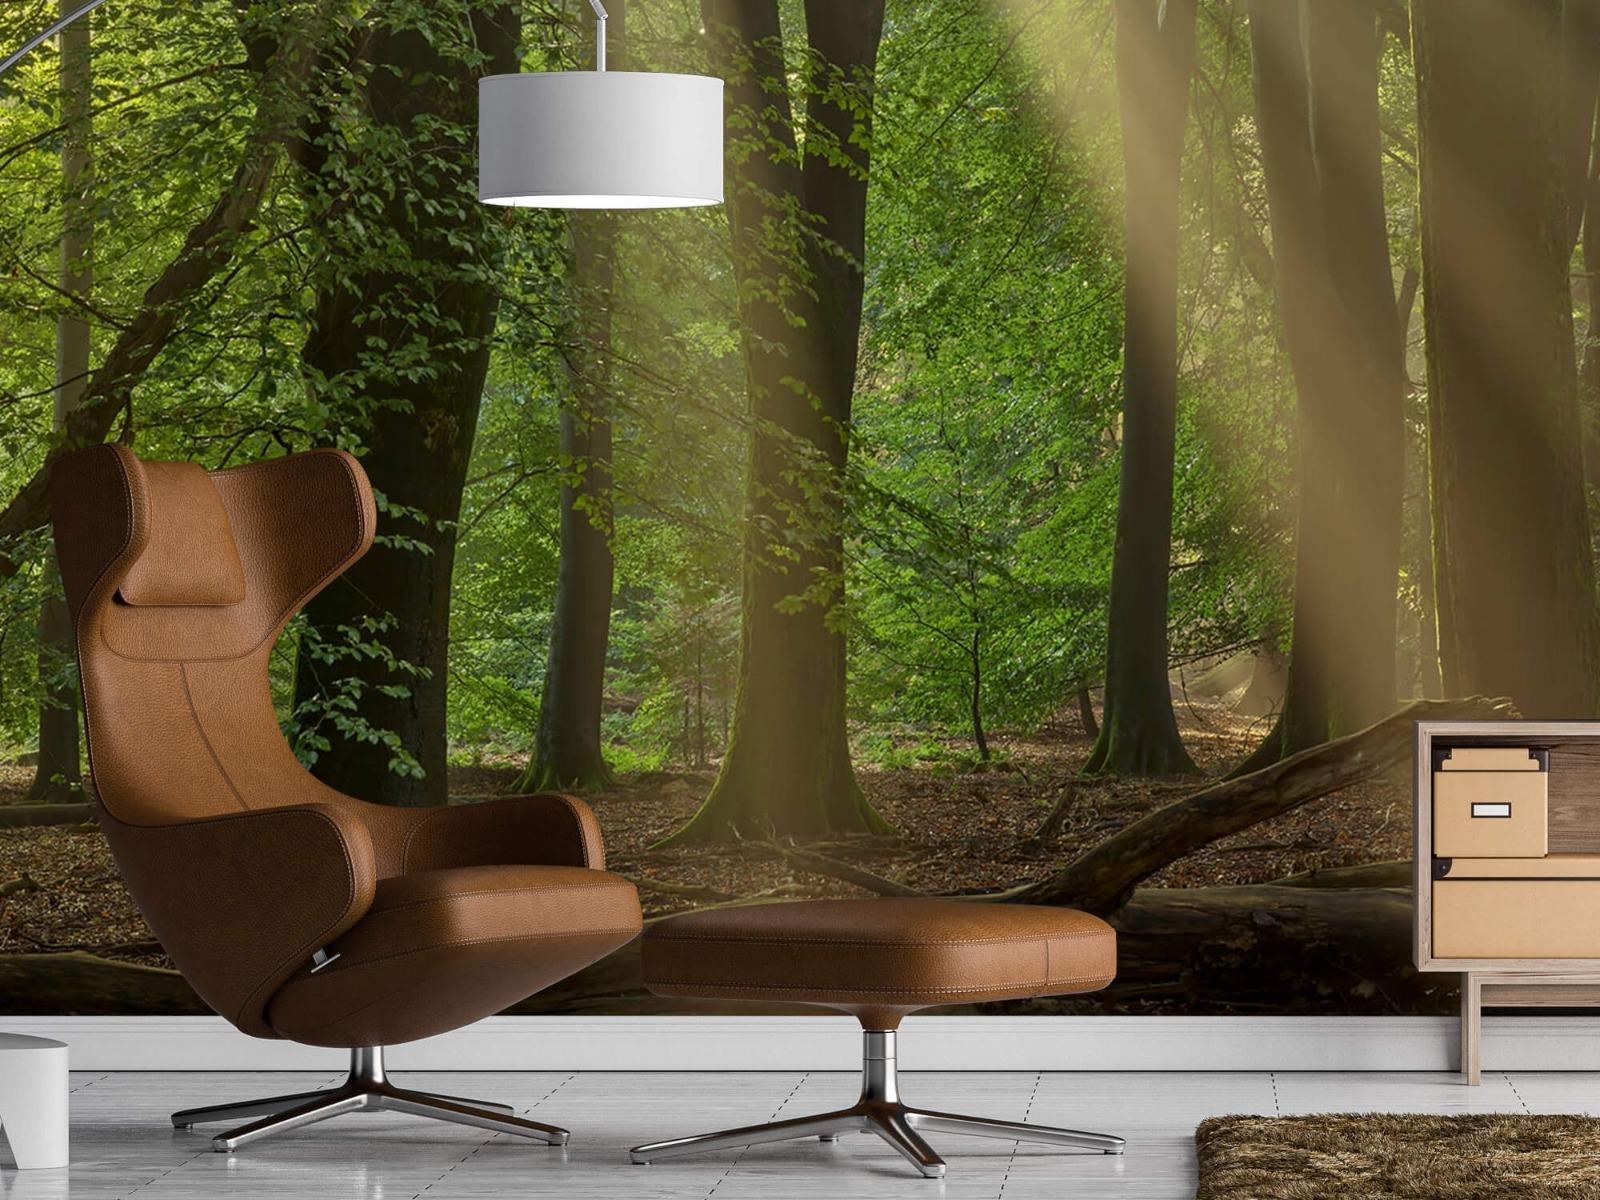 Bomen - Zonneharpen in het bos - Slaapkamer 2